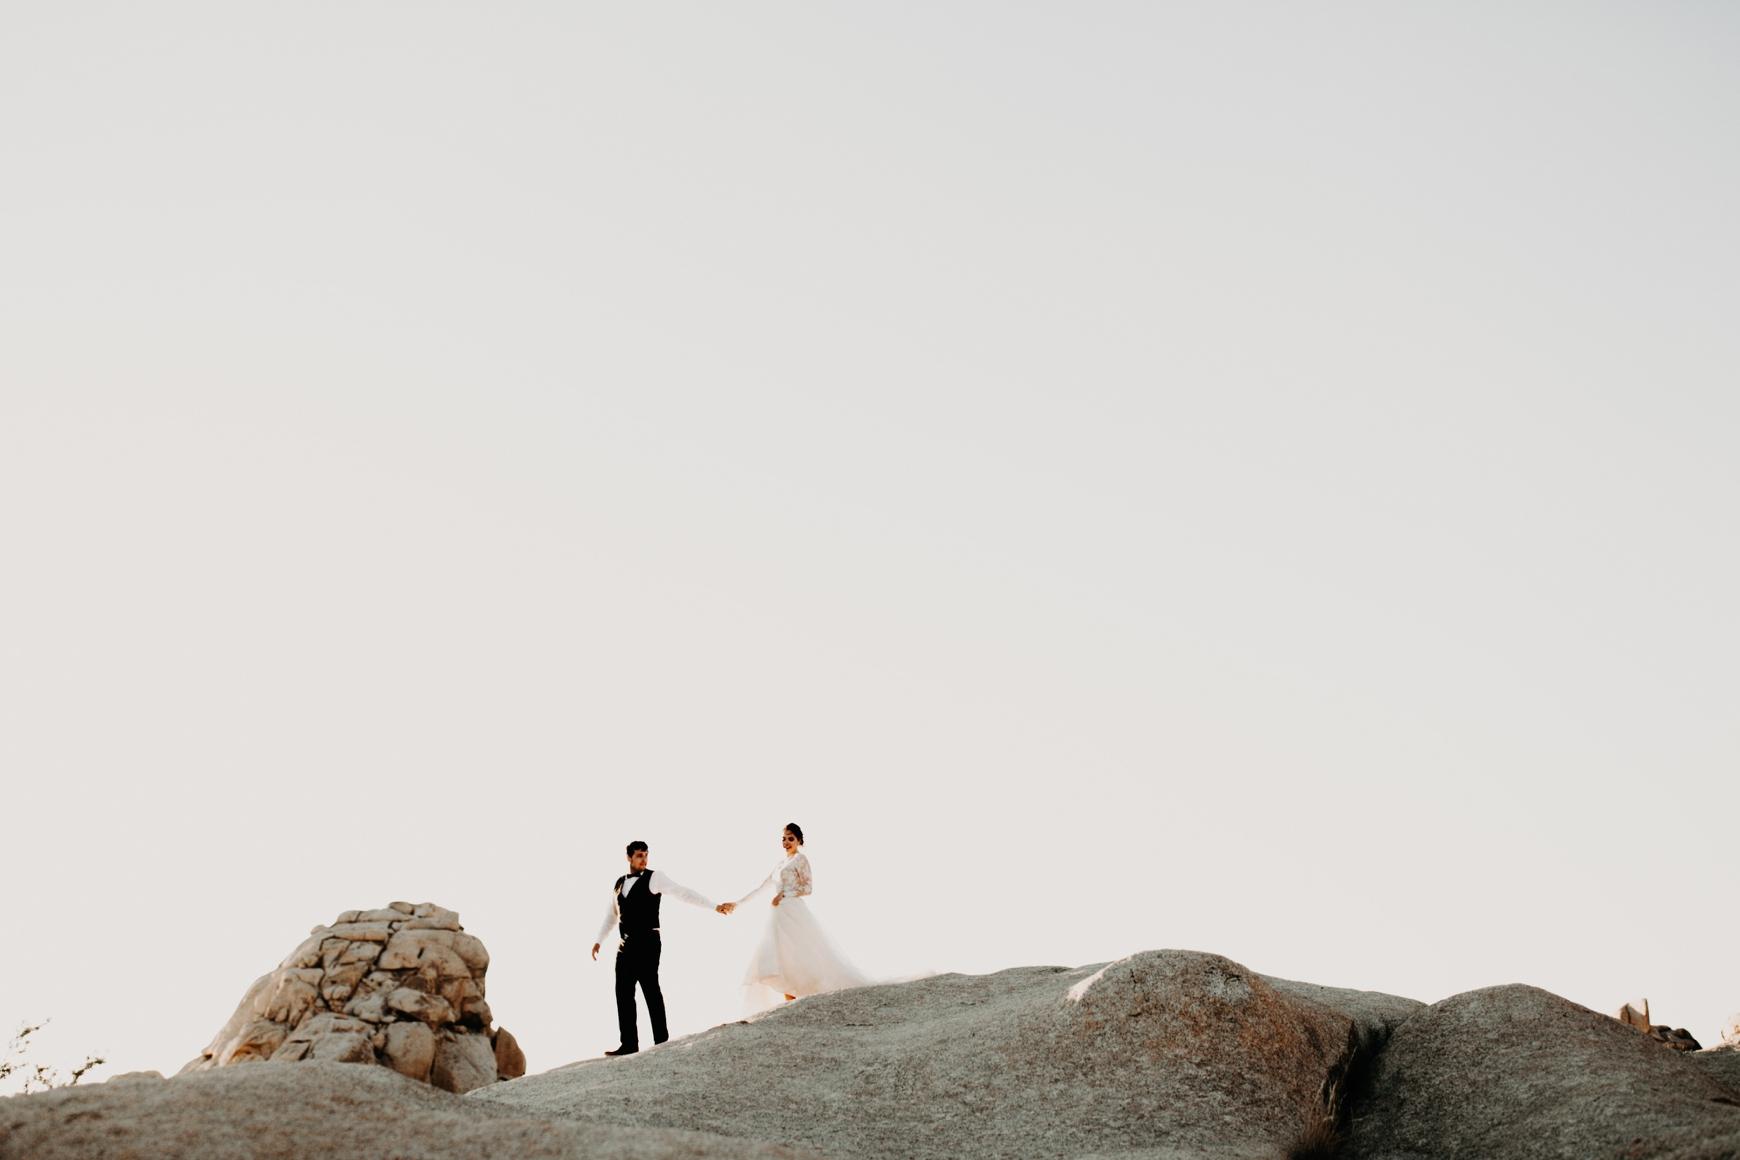 Joshua Tree Bridal Portraits Anastasia & Andrey Emily Magers Photography-255.jpg